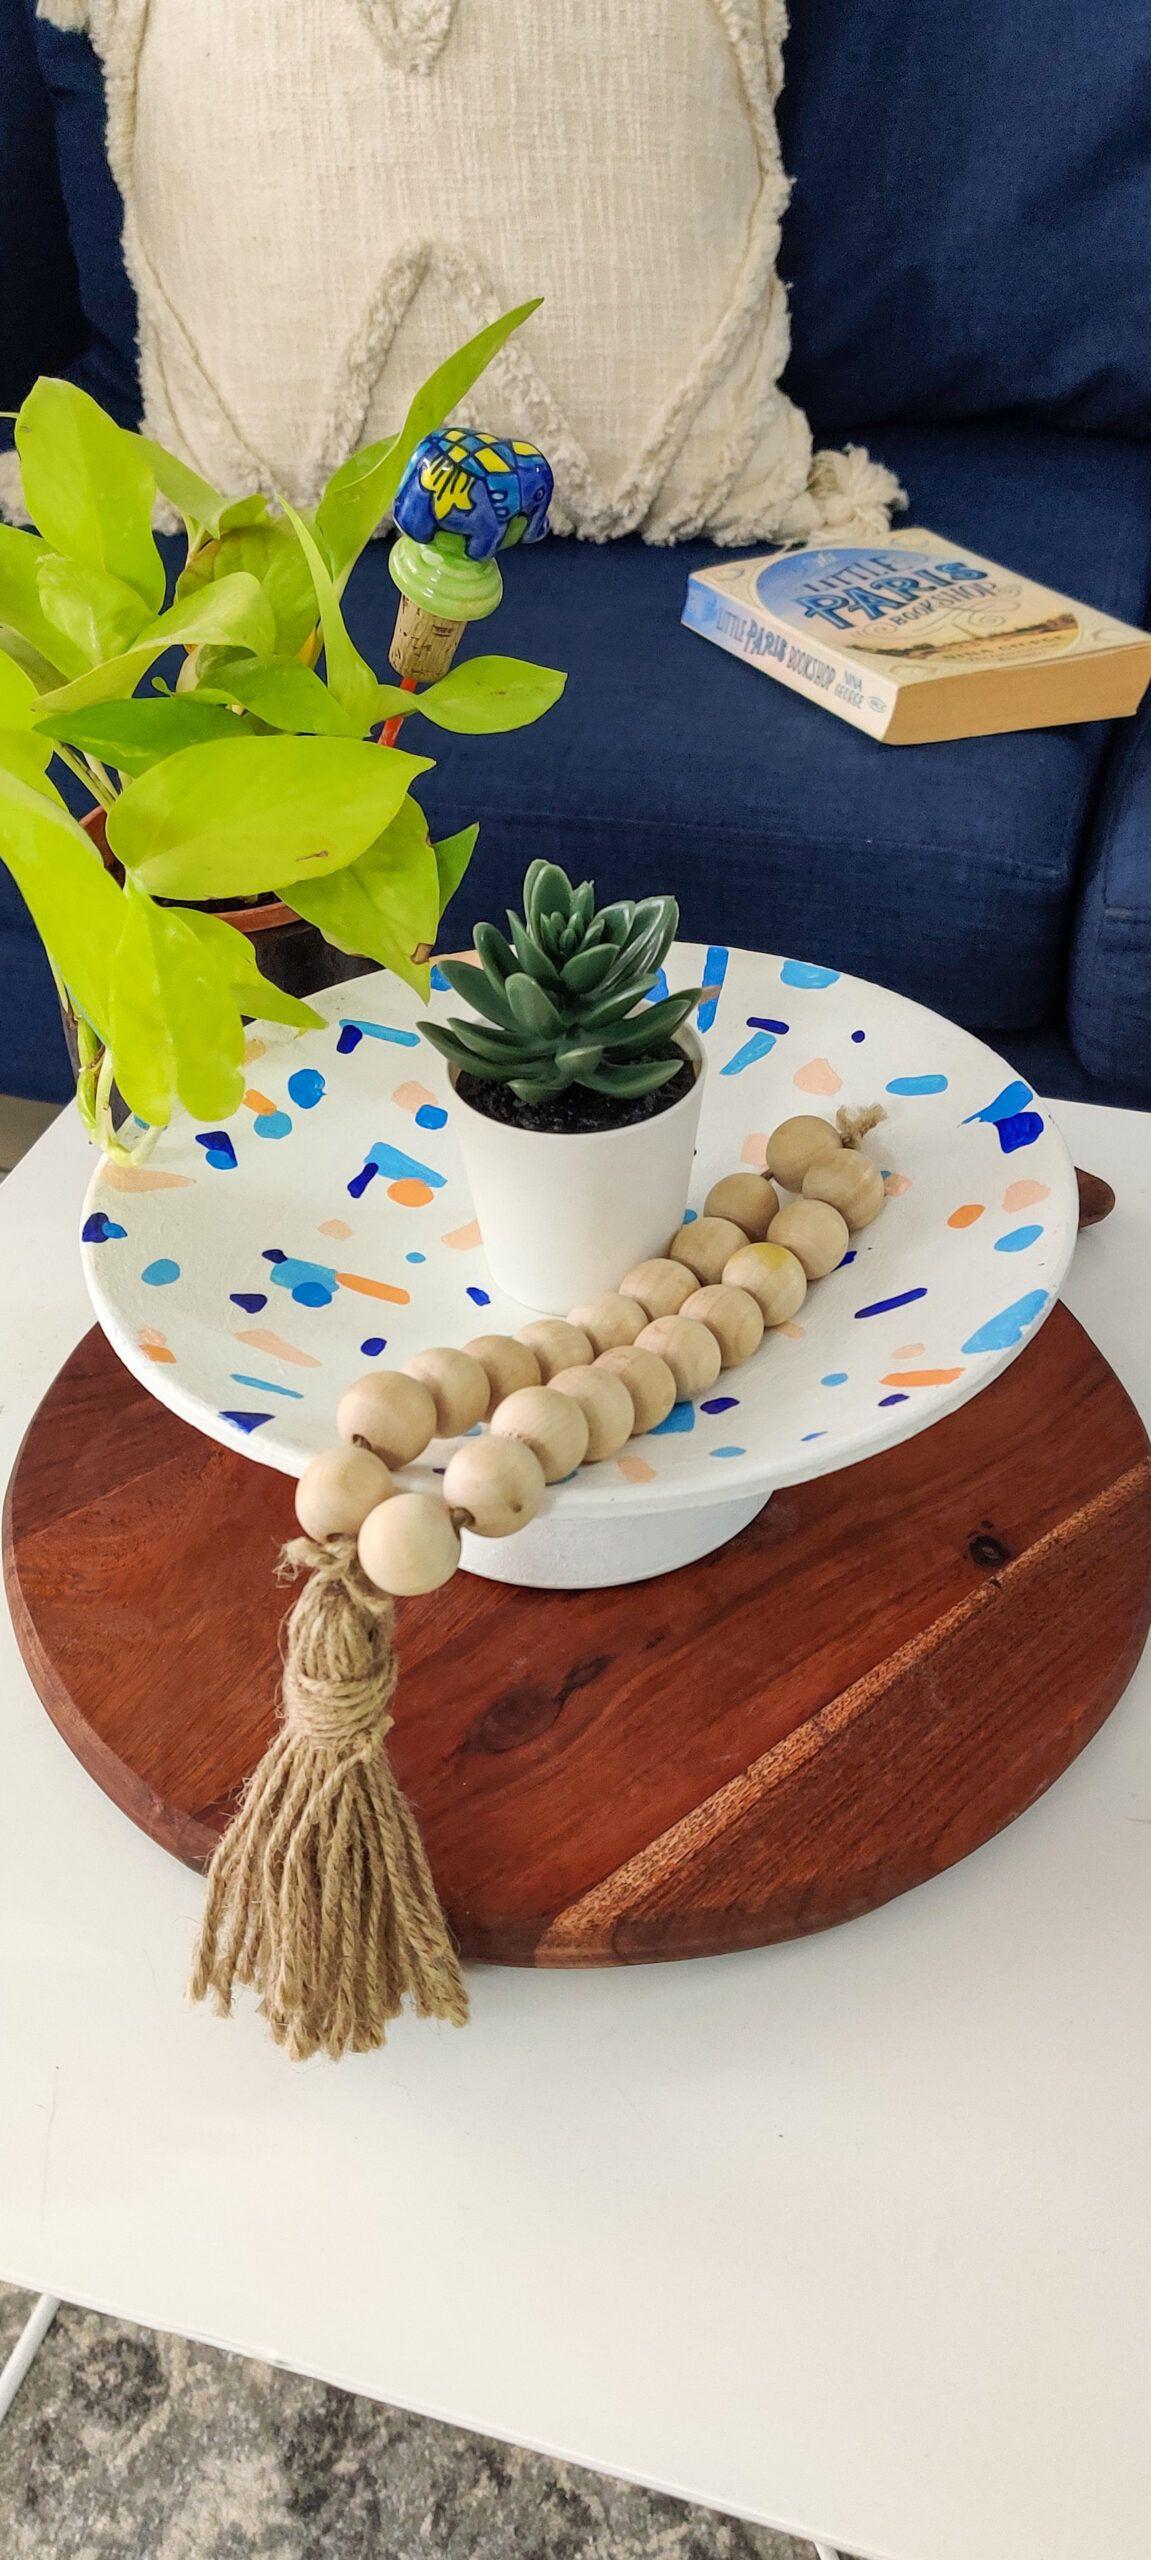 diy home decor-earthenware-terrazzo design-after image